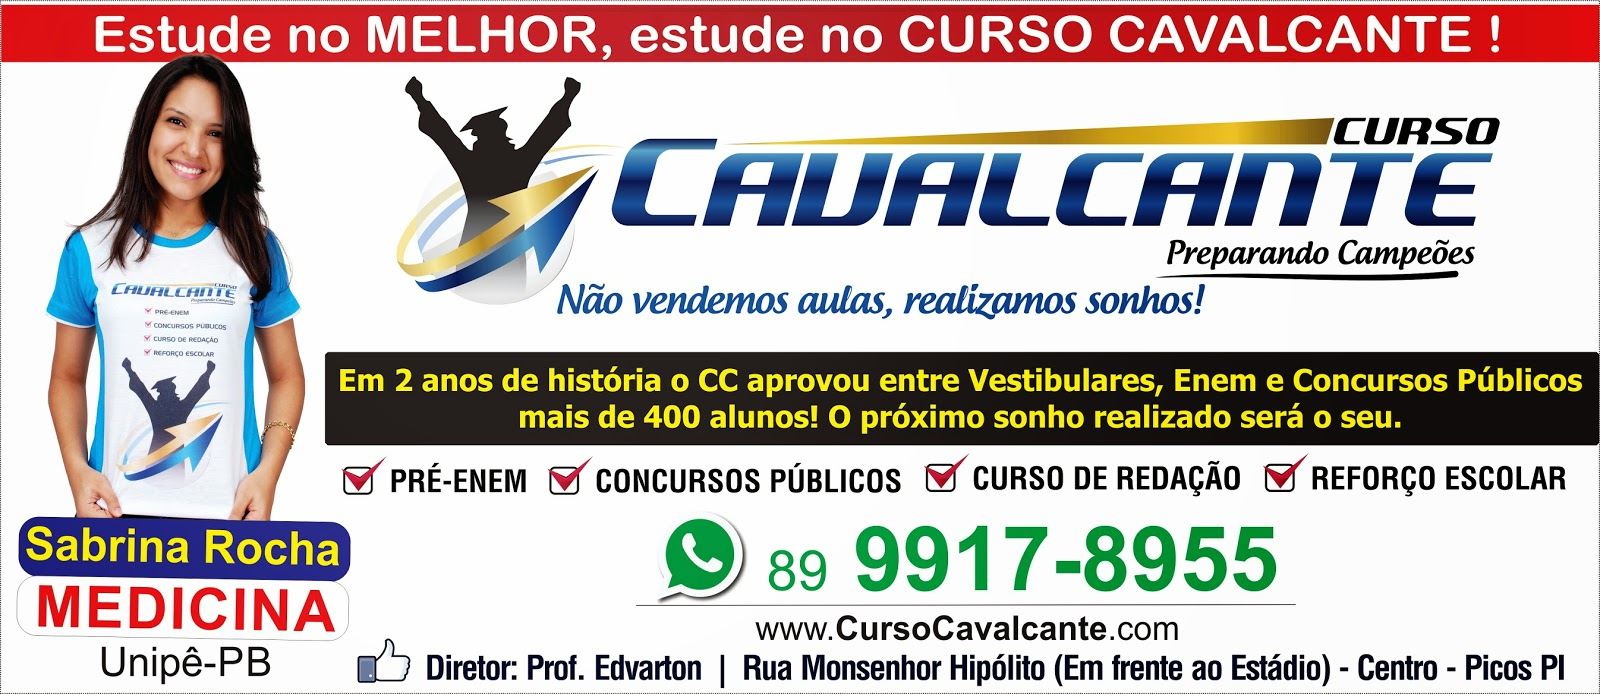 Curso Cavalcante - preparando campeões!